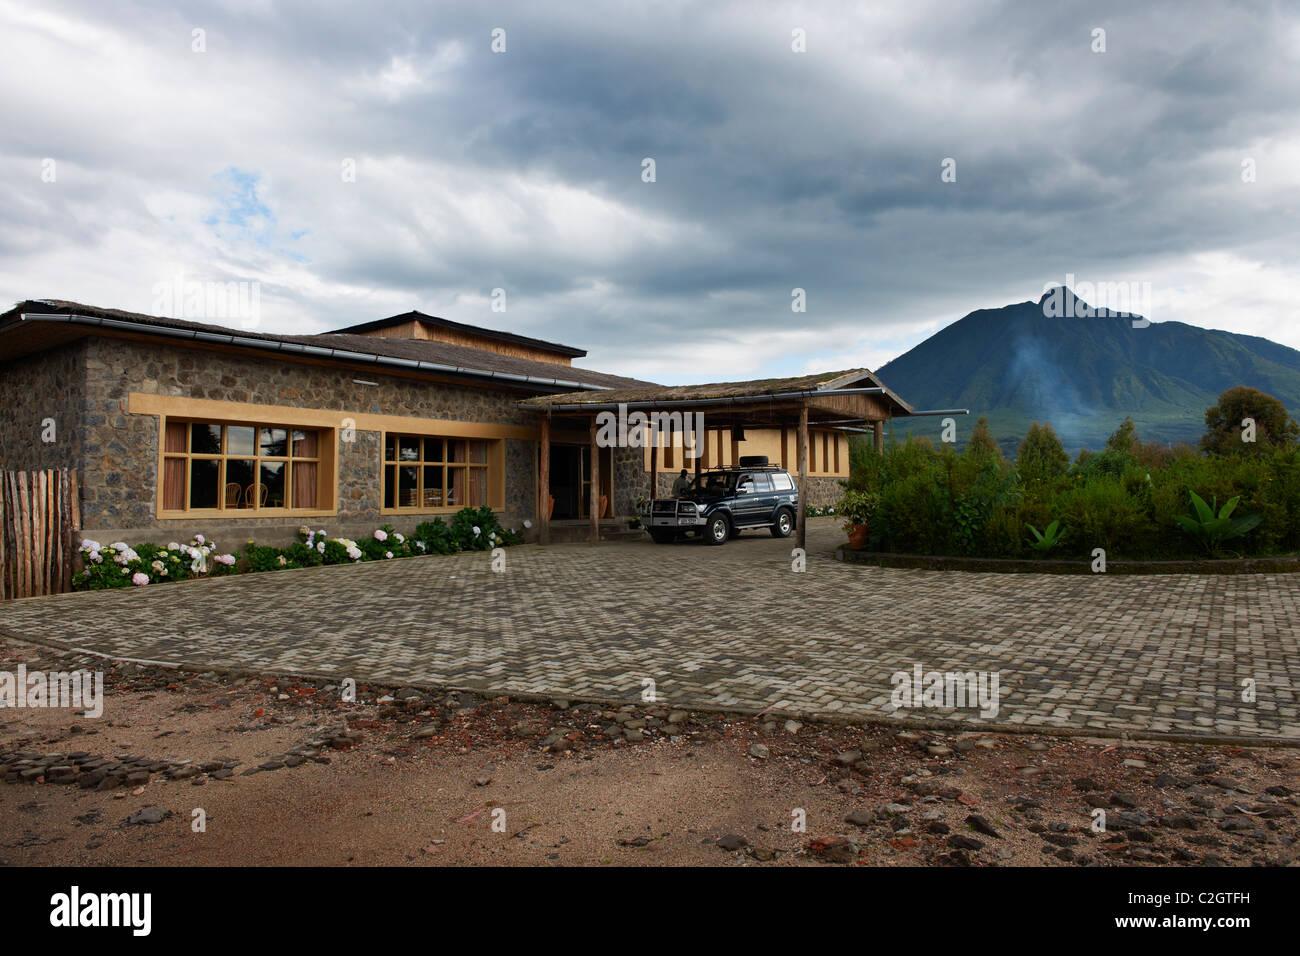 Gorilla Mountain View Lodge and Mount Sabyinyo, Parc National des Volcans, Virunga Mountains, Rwanda, Africa - Stock Image